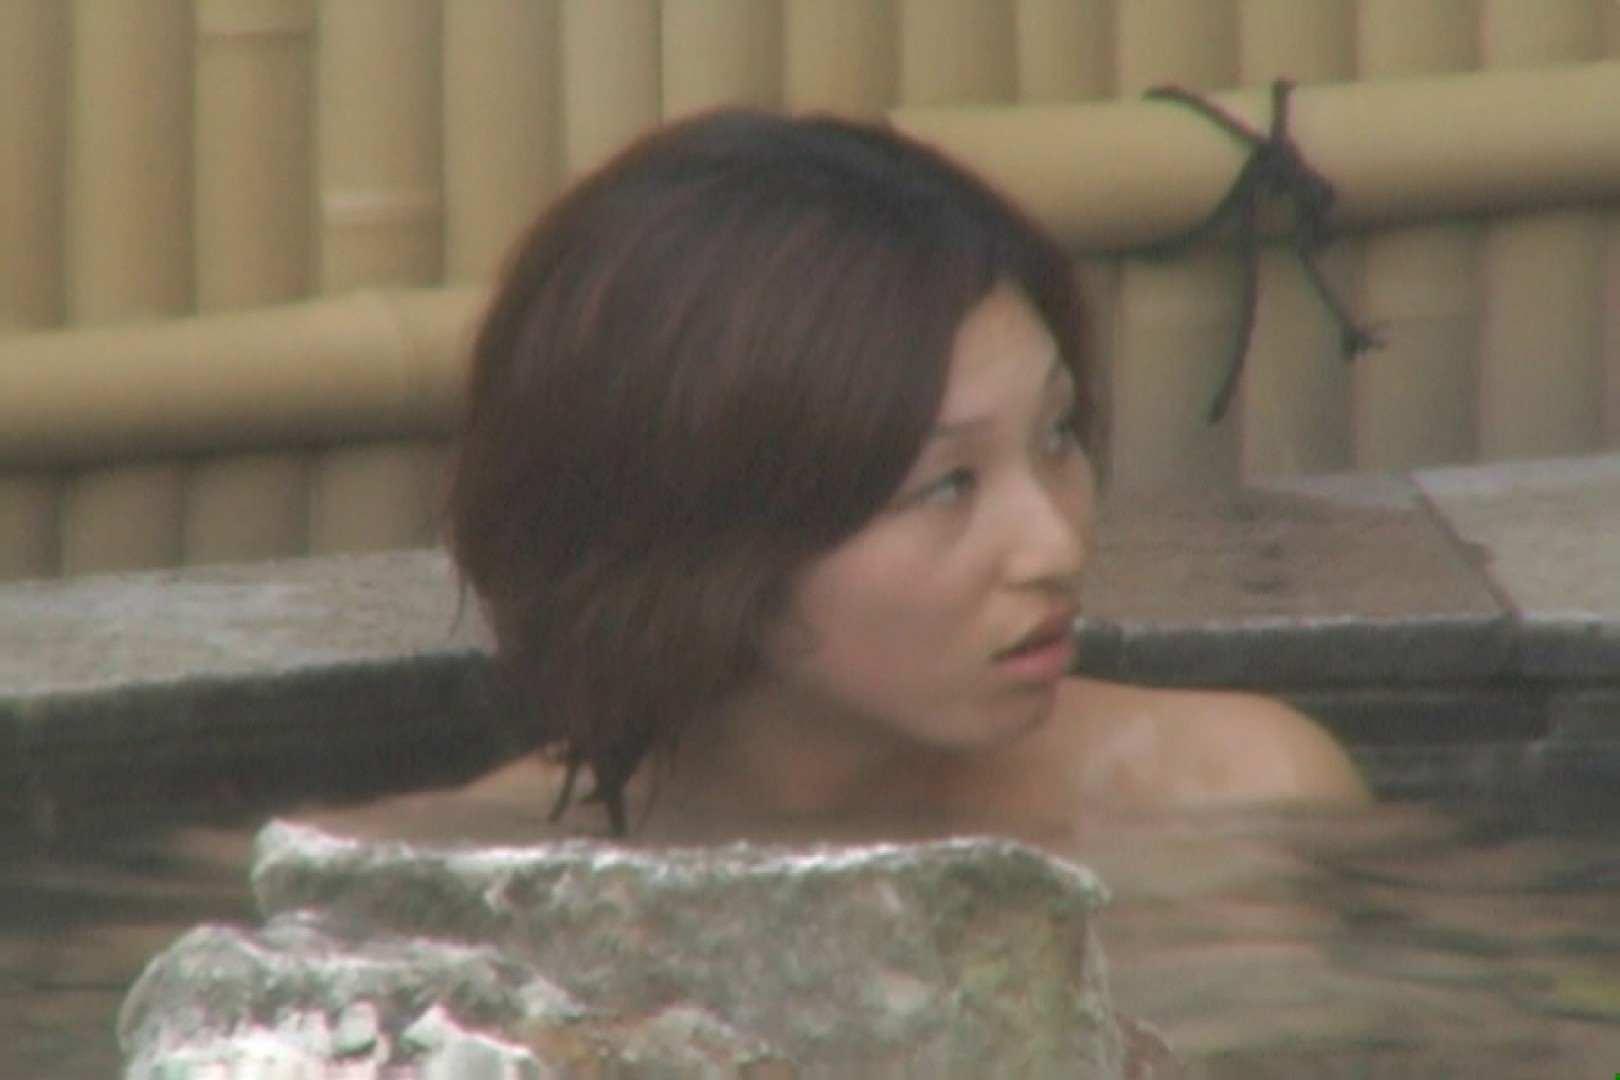 Aquaな露天風呂Vol.610 HなOL | 露天  56pic 38